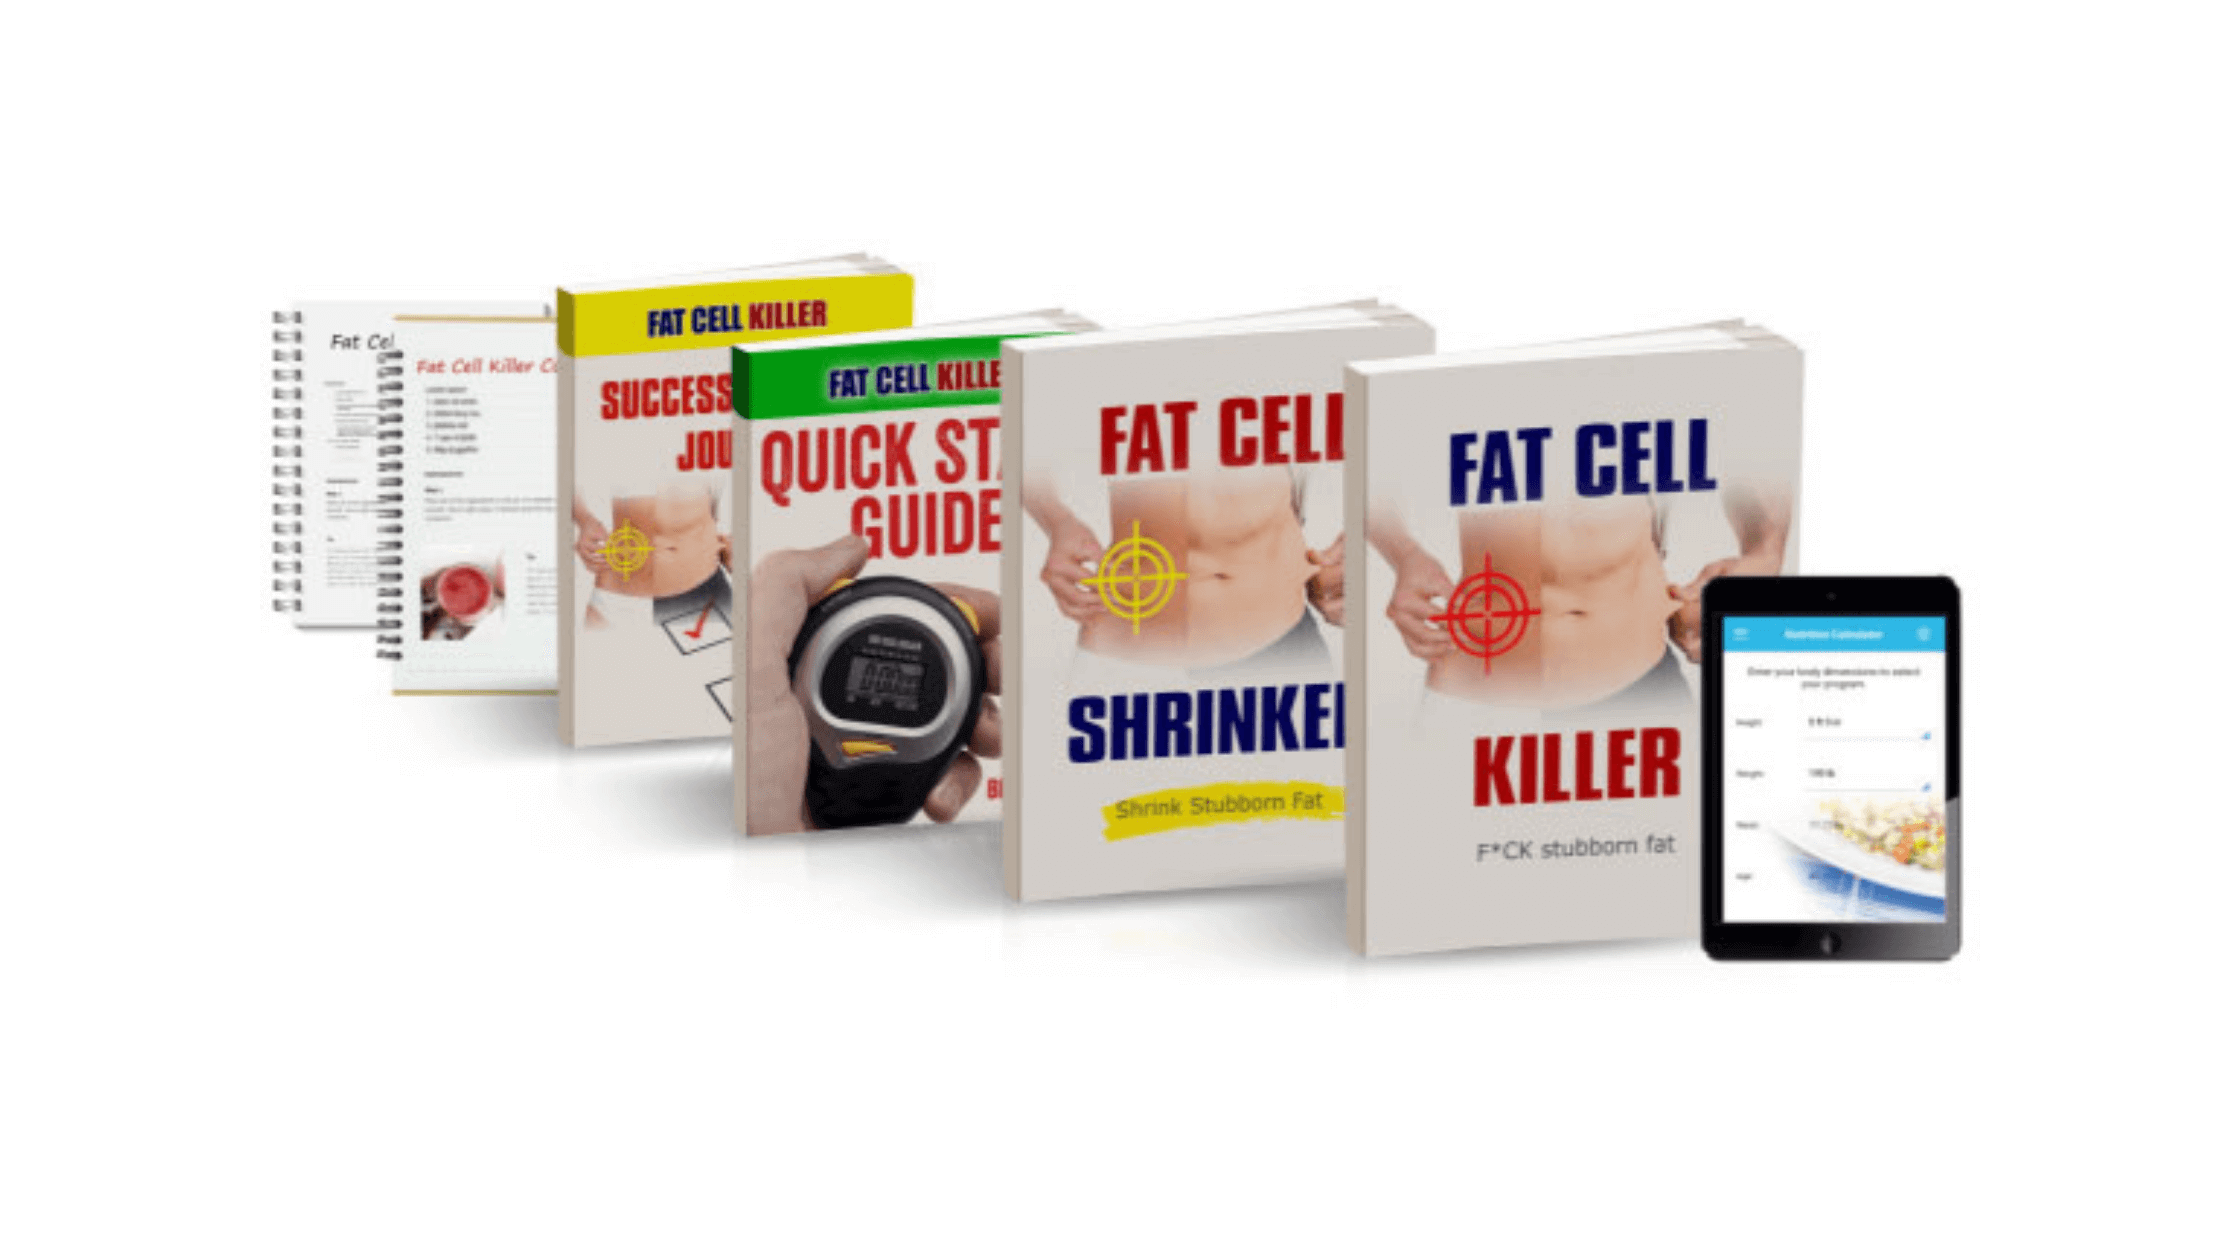 Fat Cell Killer reviews